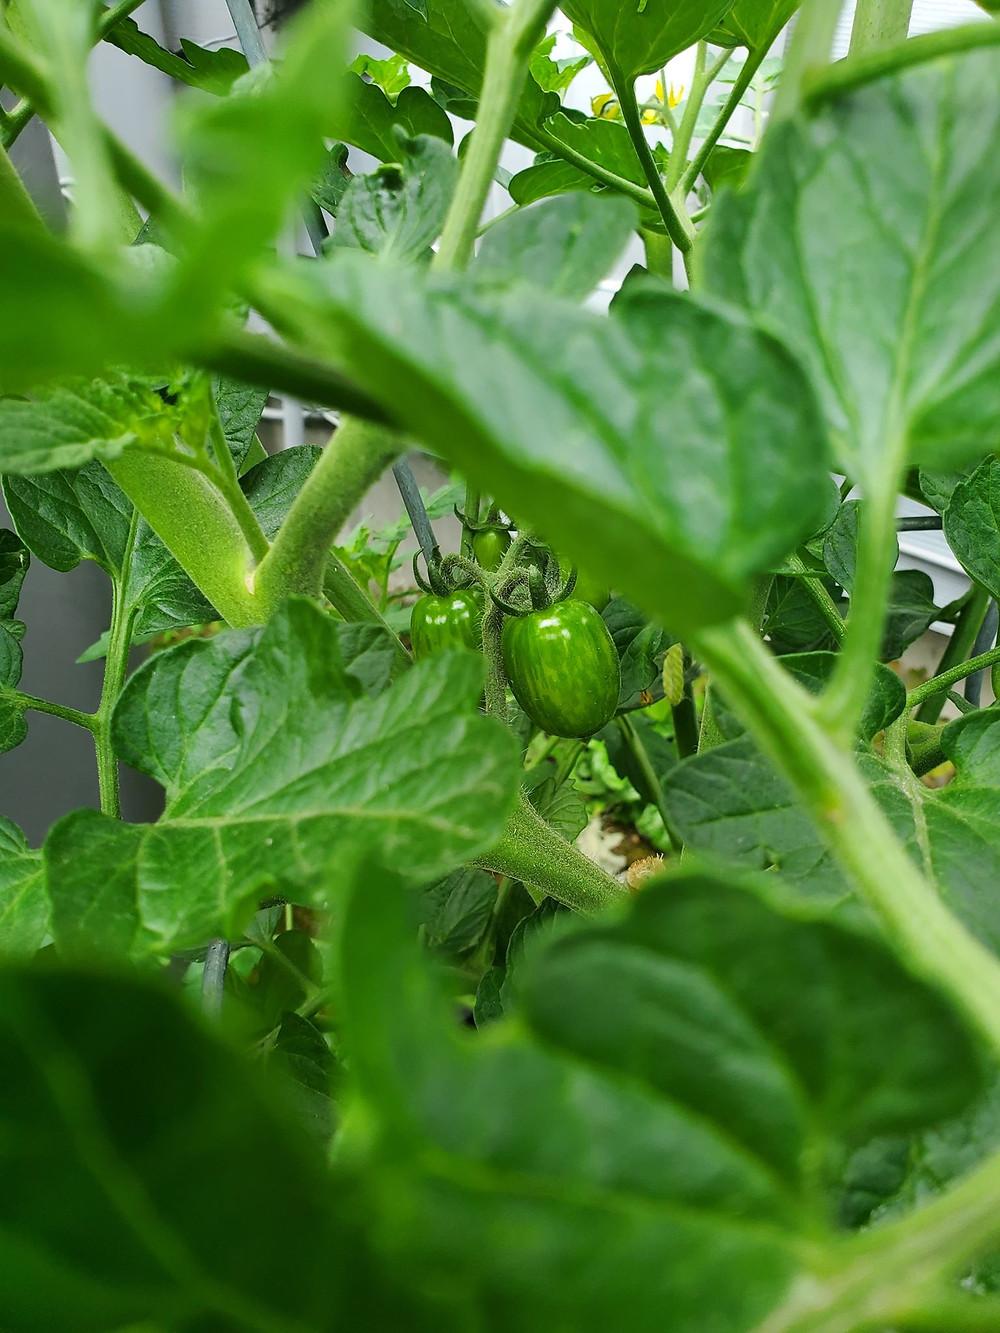 Peering through the foliage, a growing chocolate cherry tomato hangs.